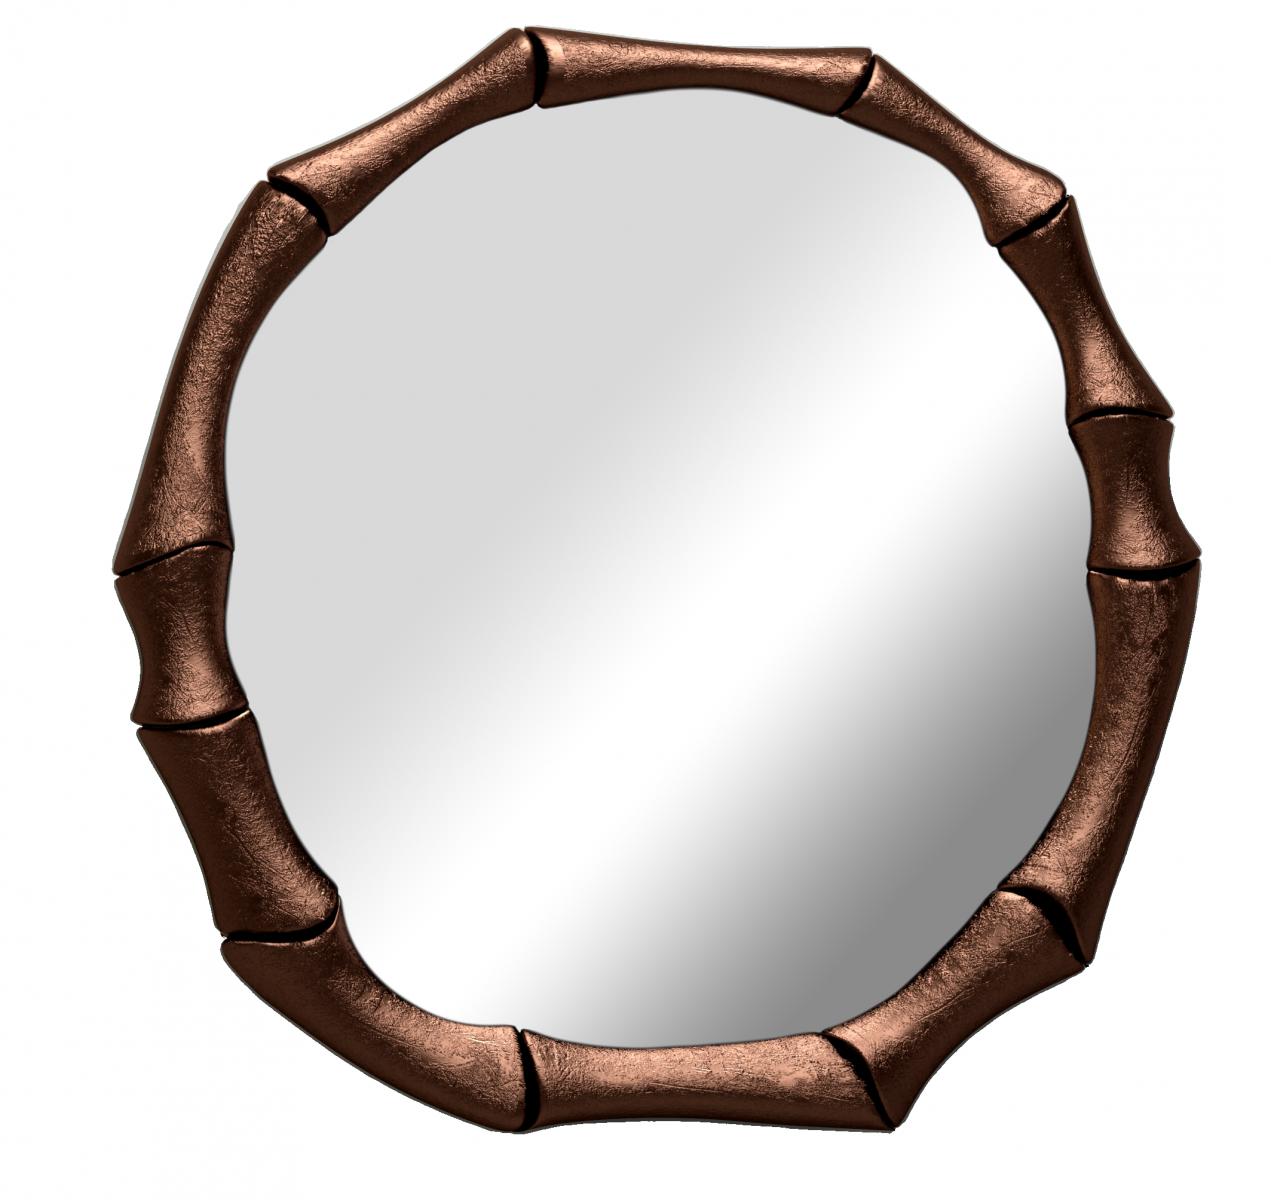 Mirror PNG Image